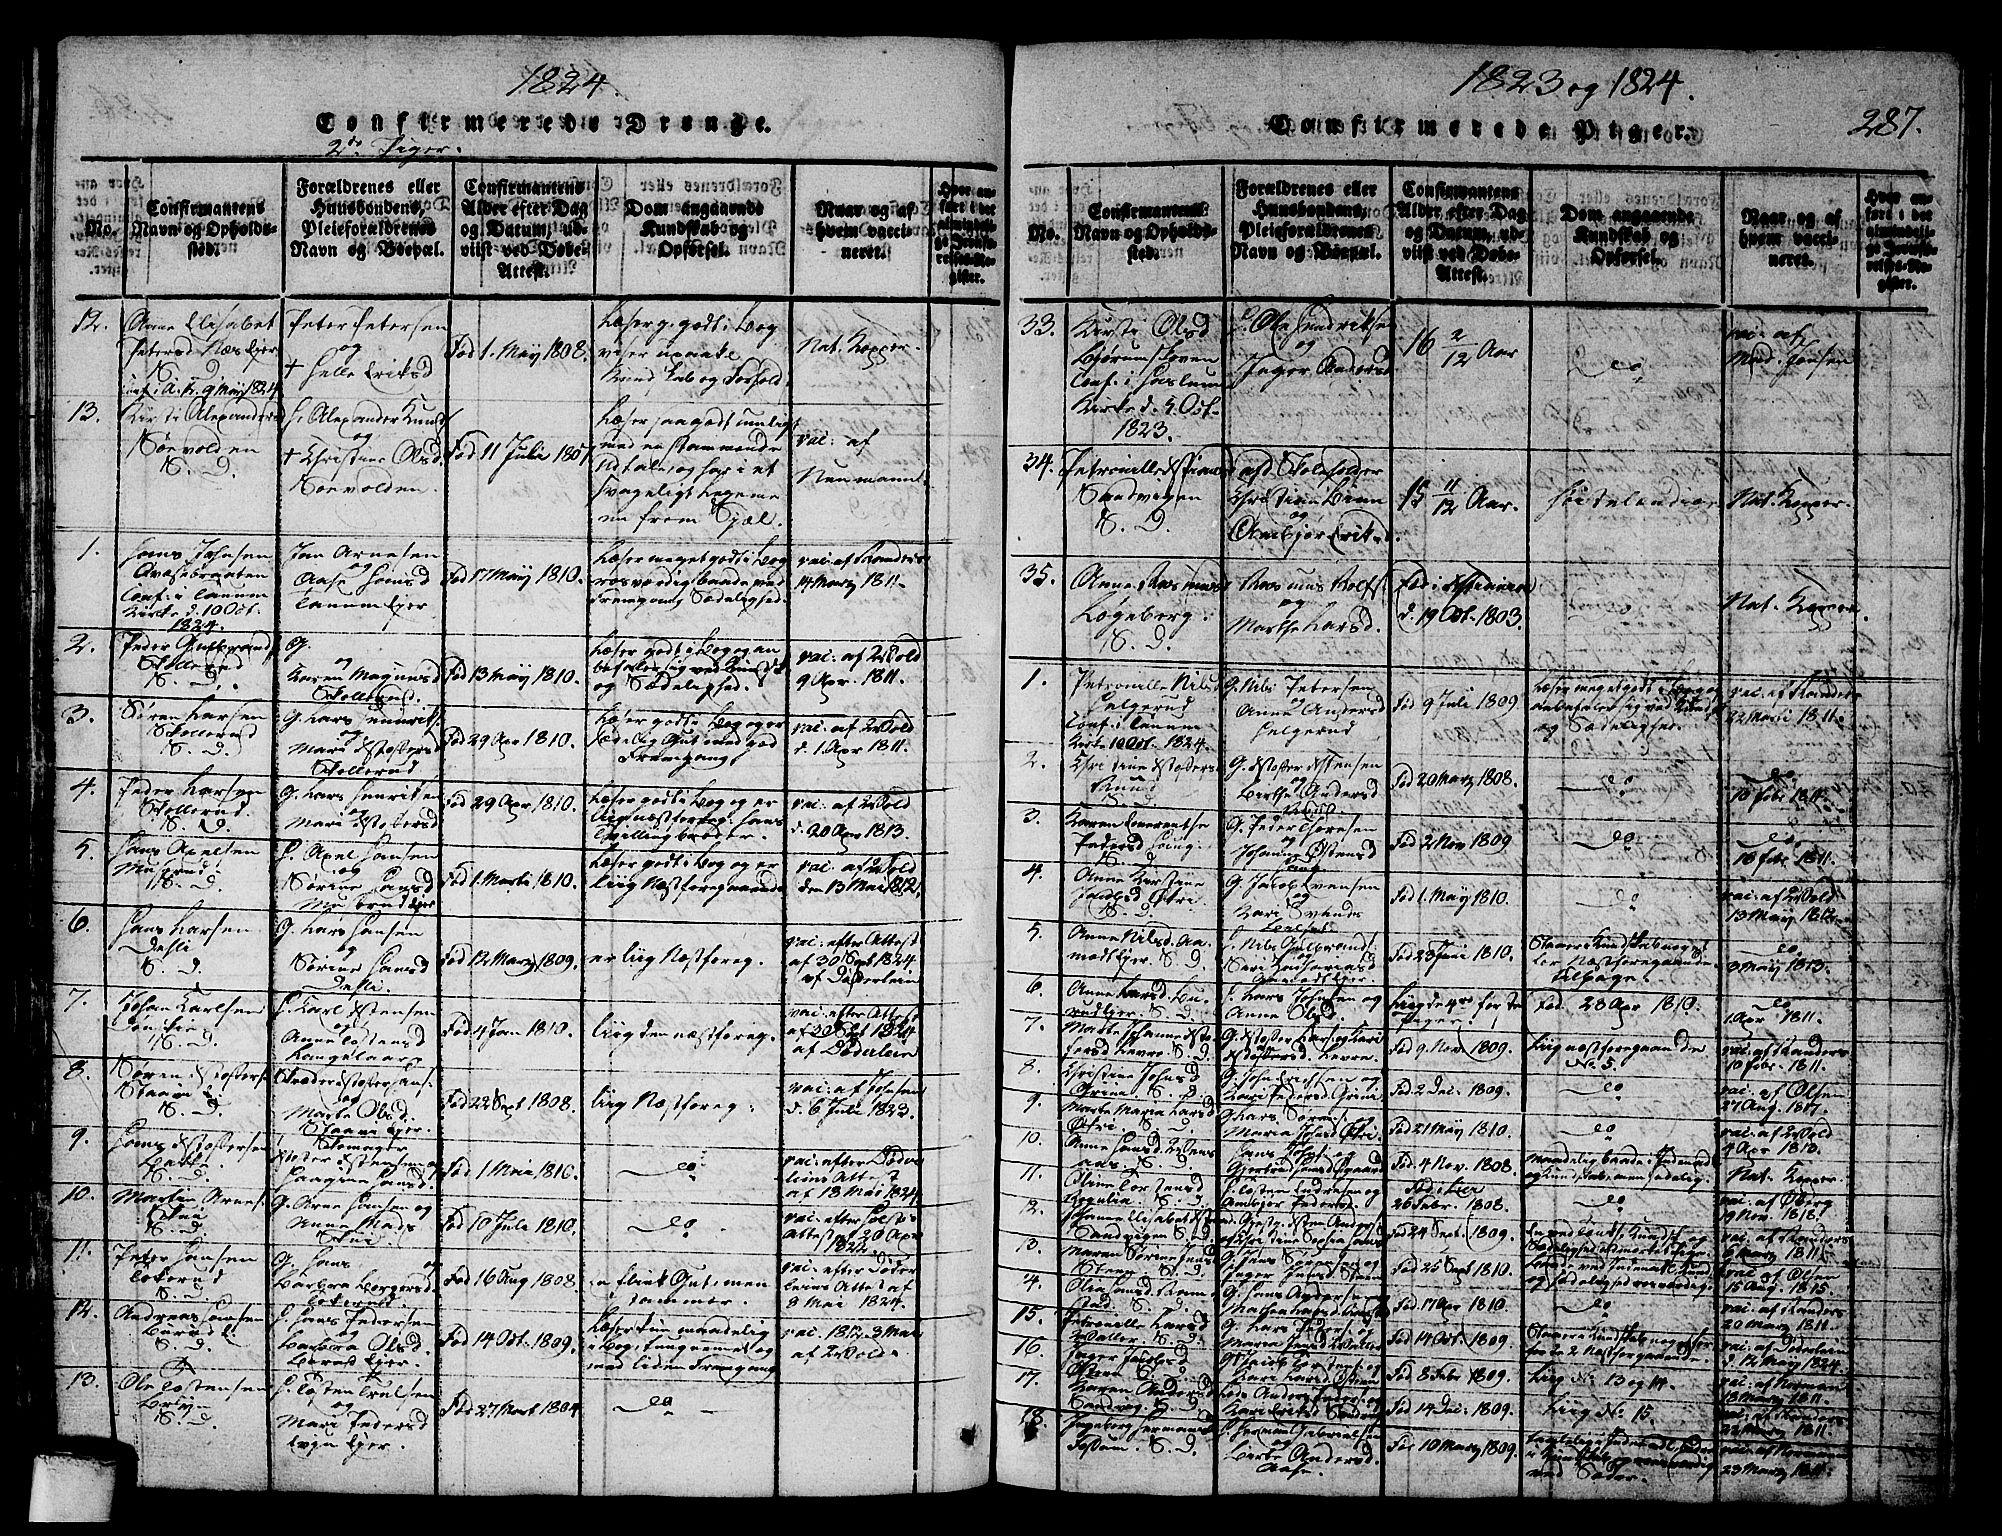 SAO, Asker prestekontor Kirkebøker, G/Ga/L0001: Klokkerbok nr. I 1, 1814-1830, s. 287